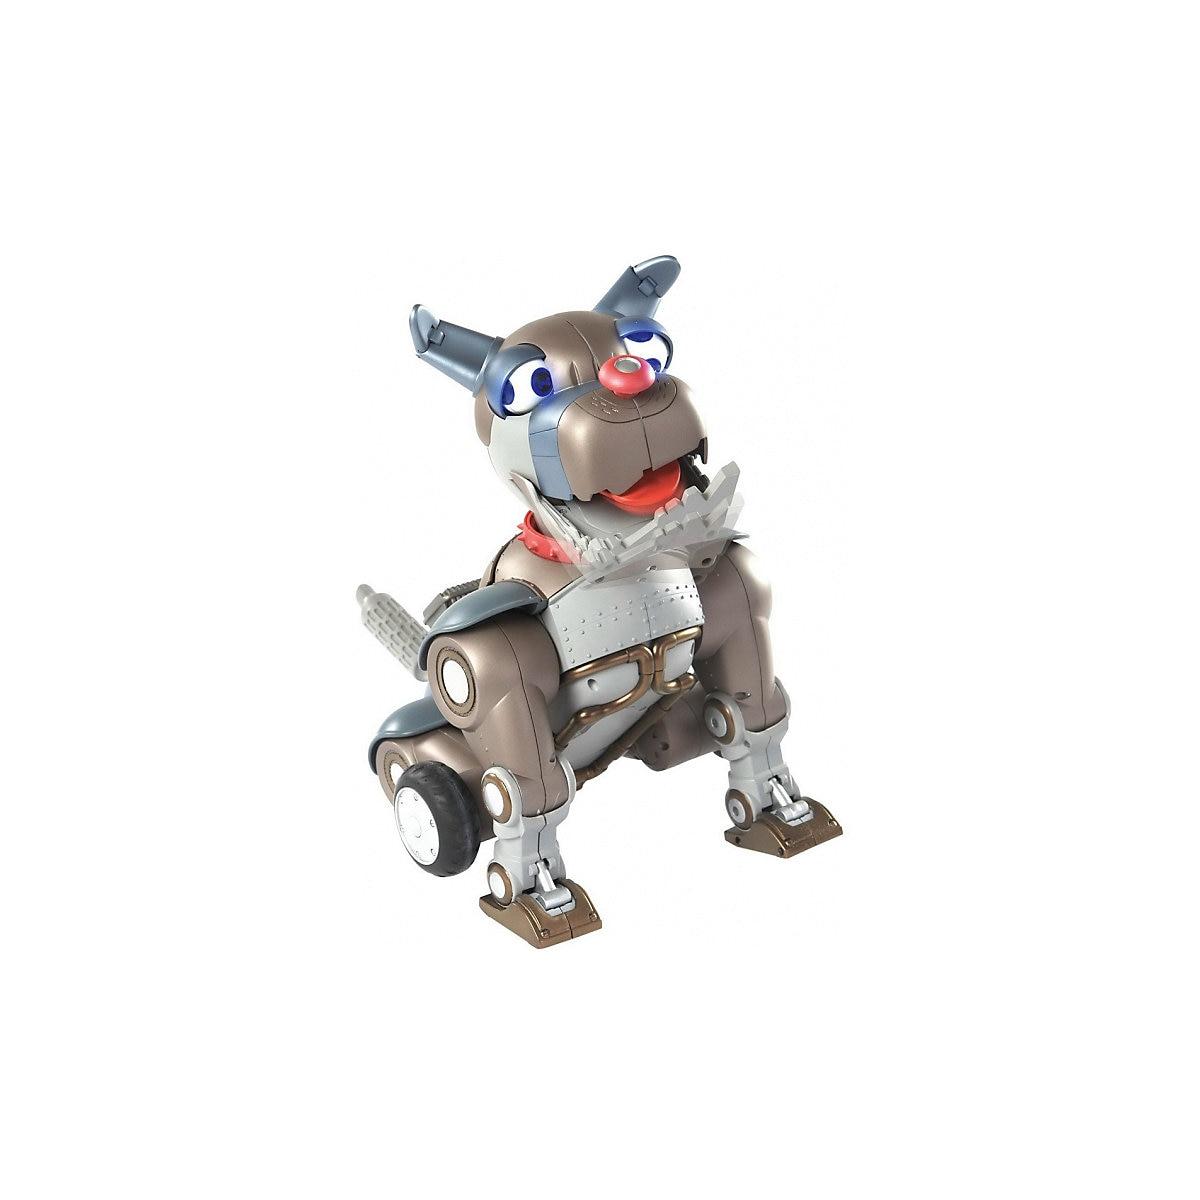 Electronic Pets WowWee 7925641 Tamagochi Robot Toys Interactive Dog Animals Kids MTpromo